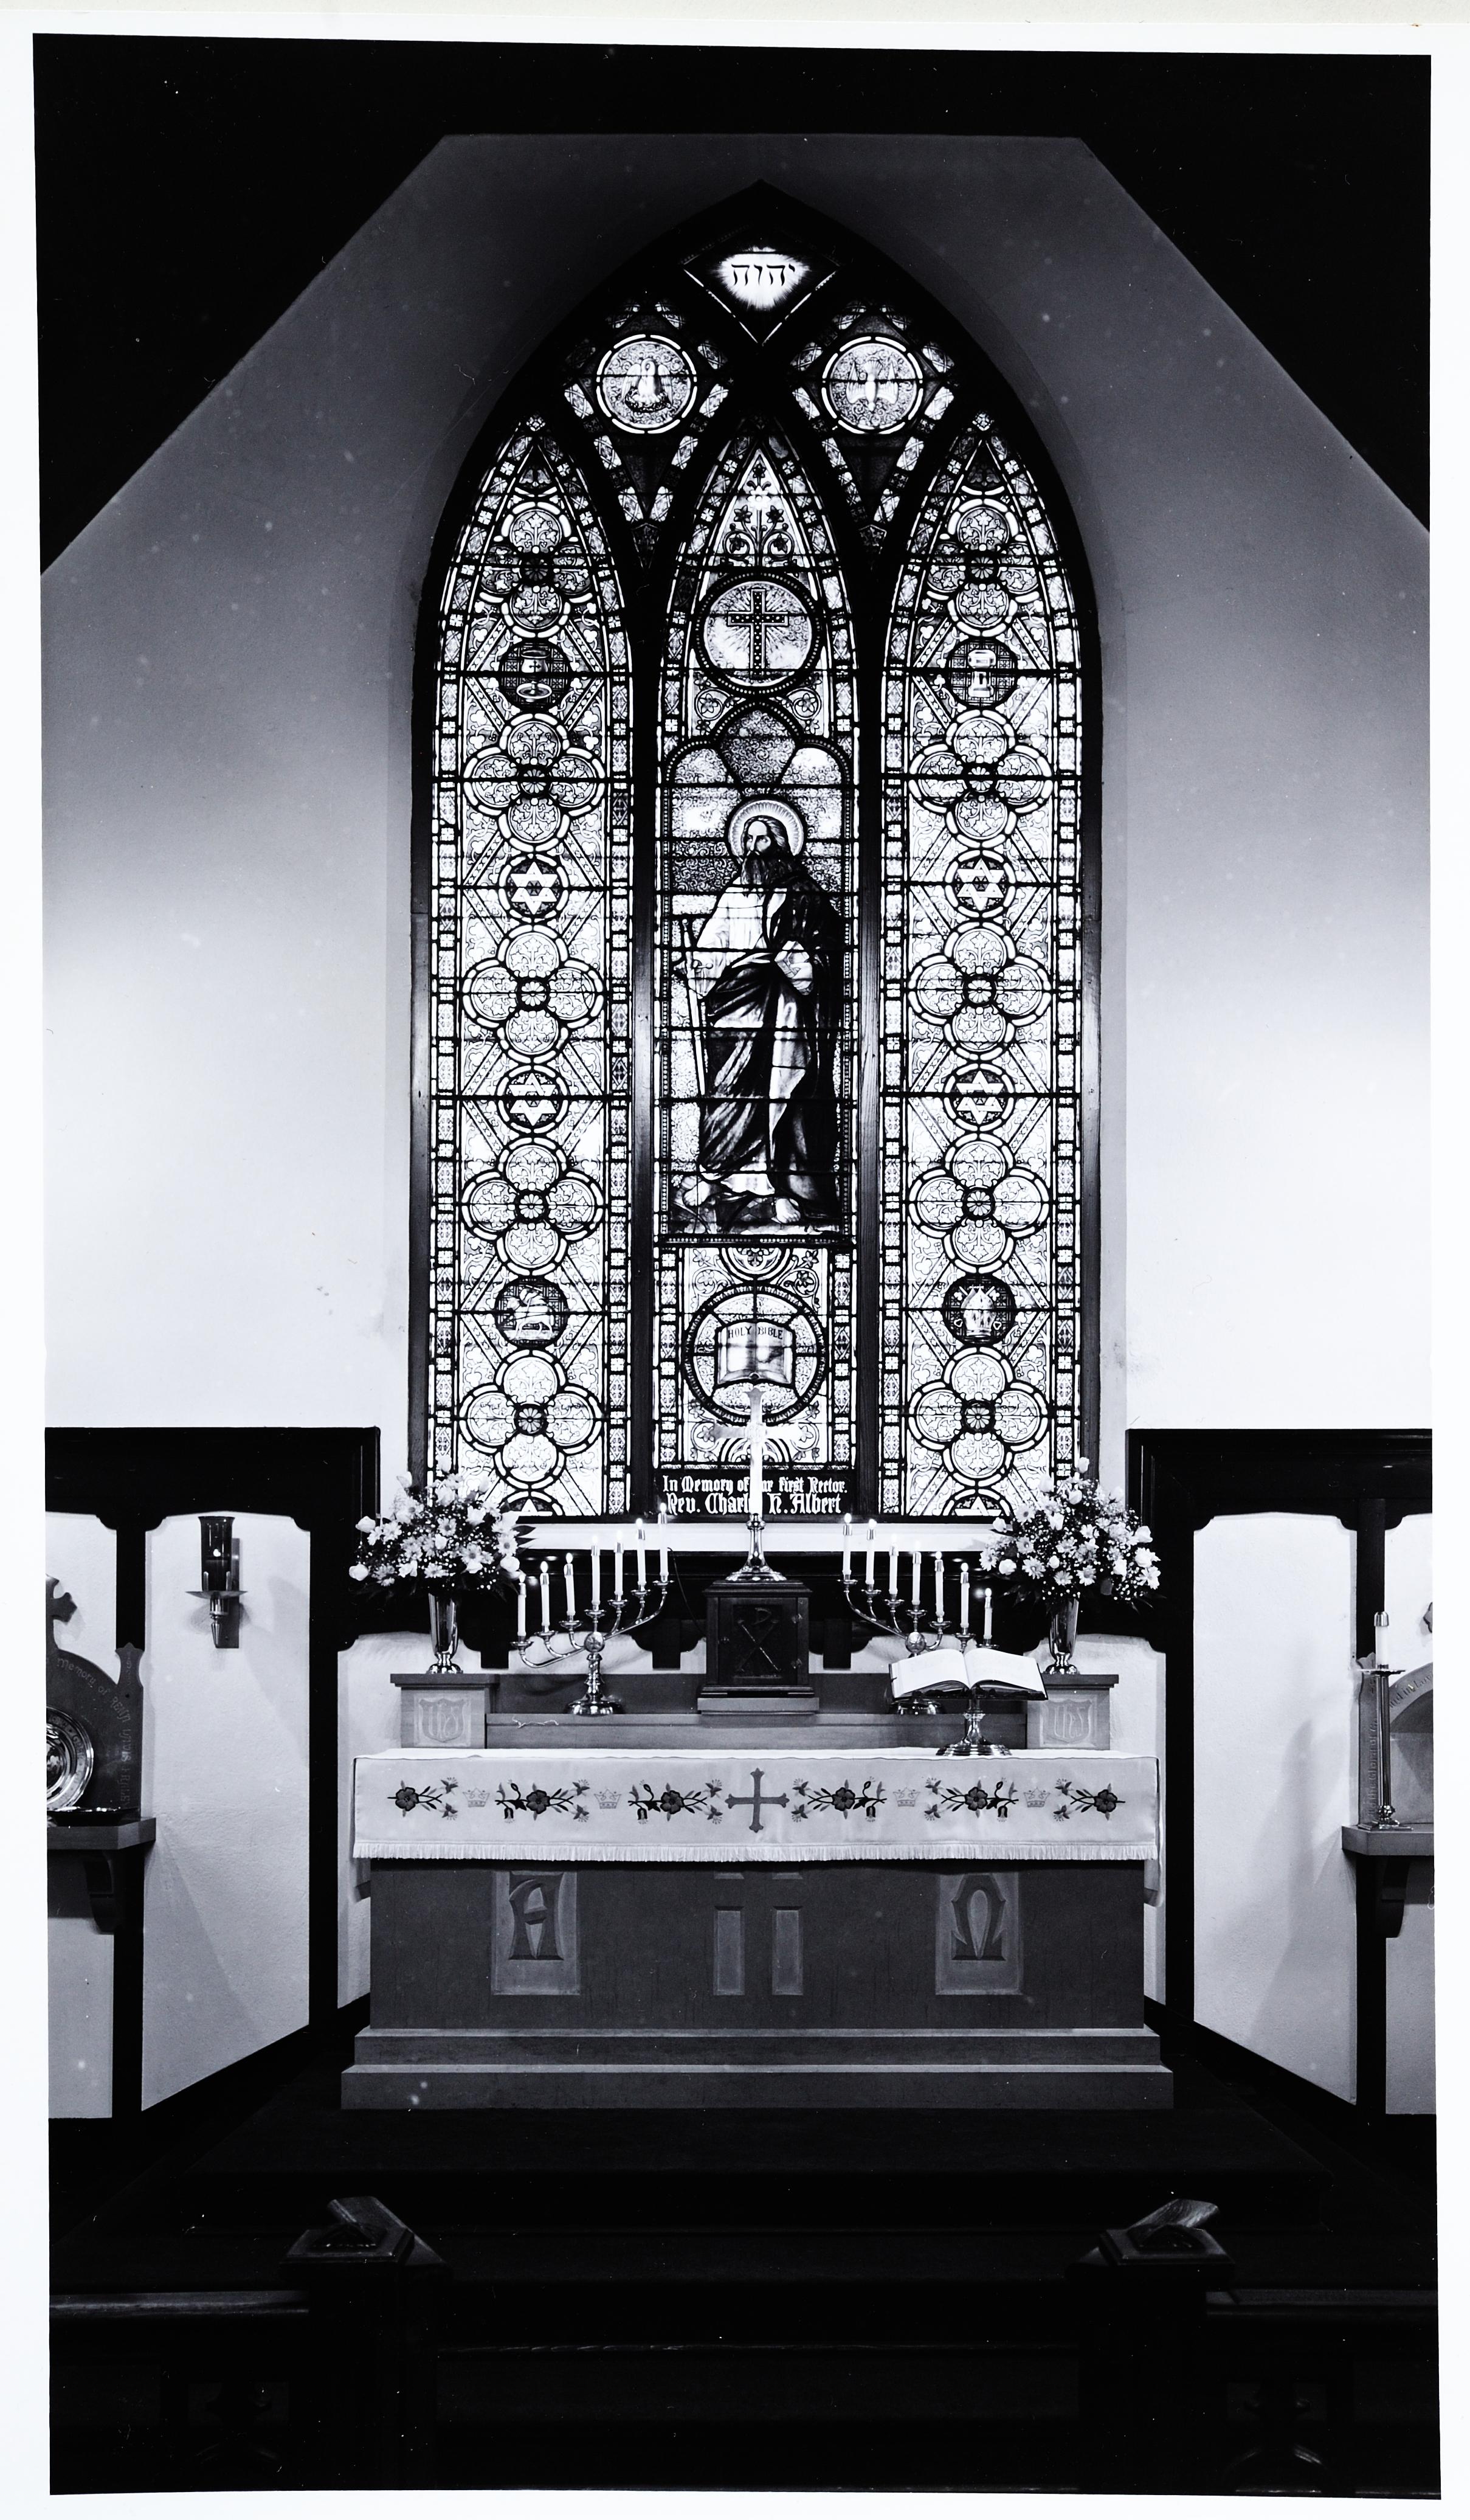 Unidentified American Studio, St. Paul And Symbols Probably 1870, Chancel,  St. Paulu0027s Episcopal Church, Batesville, Arkansas. Photo: Courtesy Of